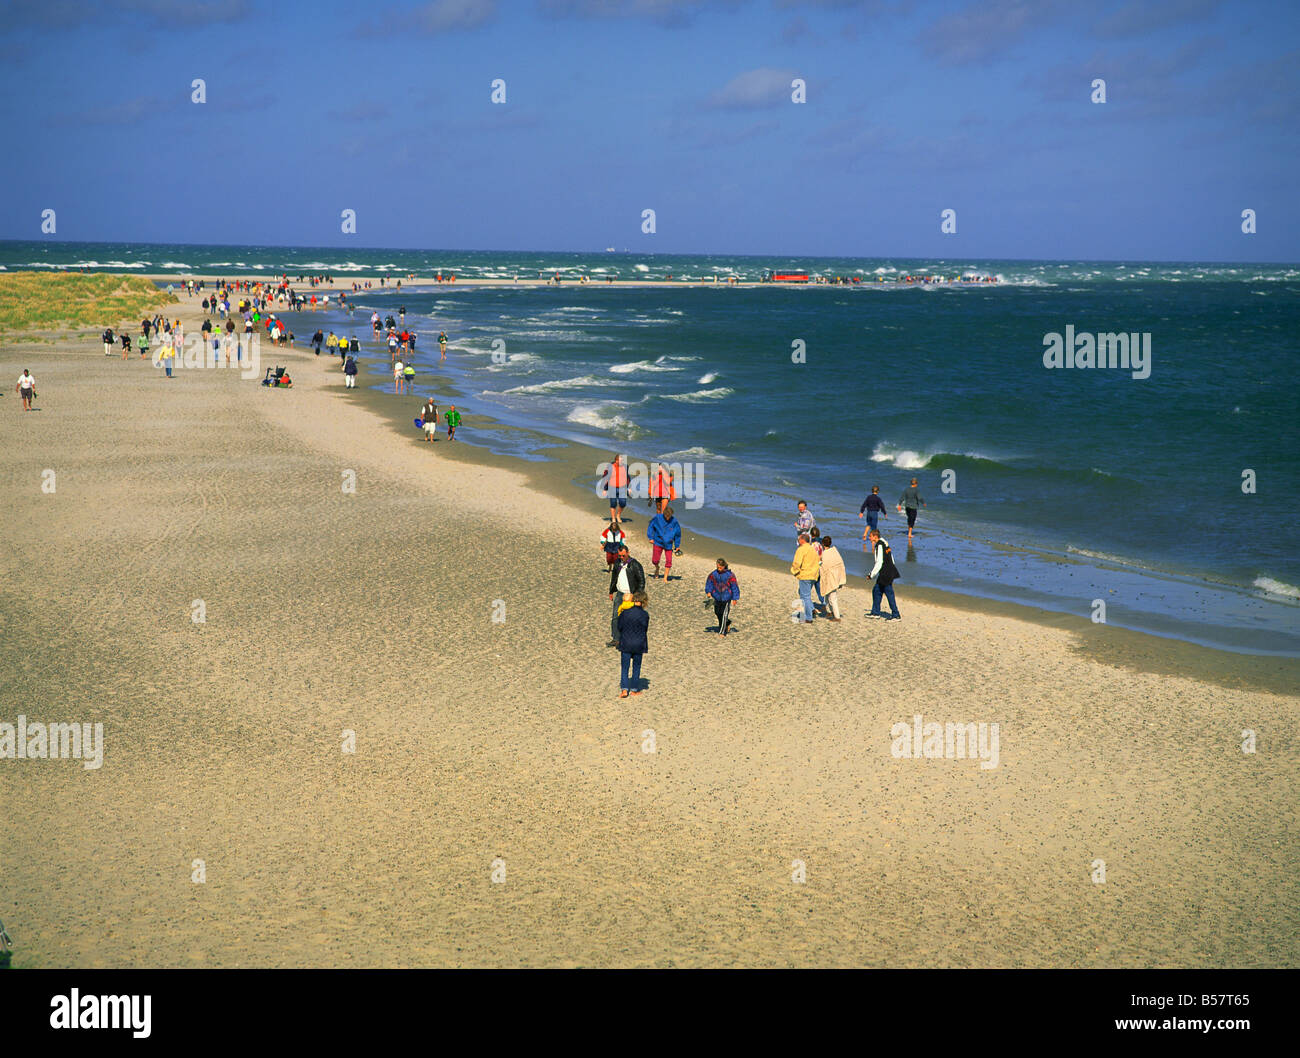 Beach and sandspit at meeting of Kattegat and Skagerrak seas Grenen northern tip of Jutland Denmark Scandinavia - Stock Image